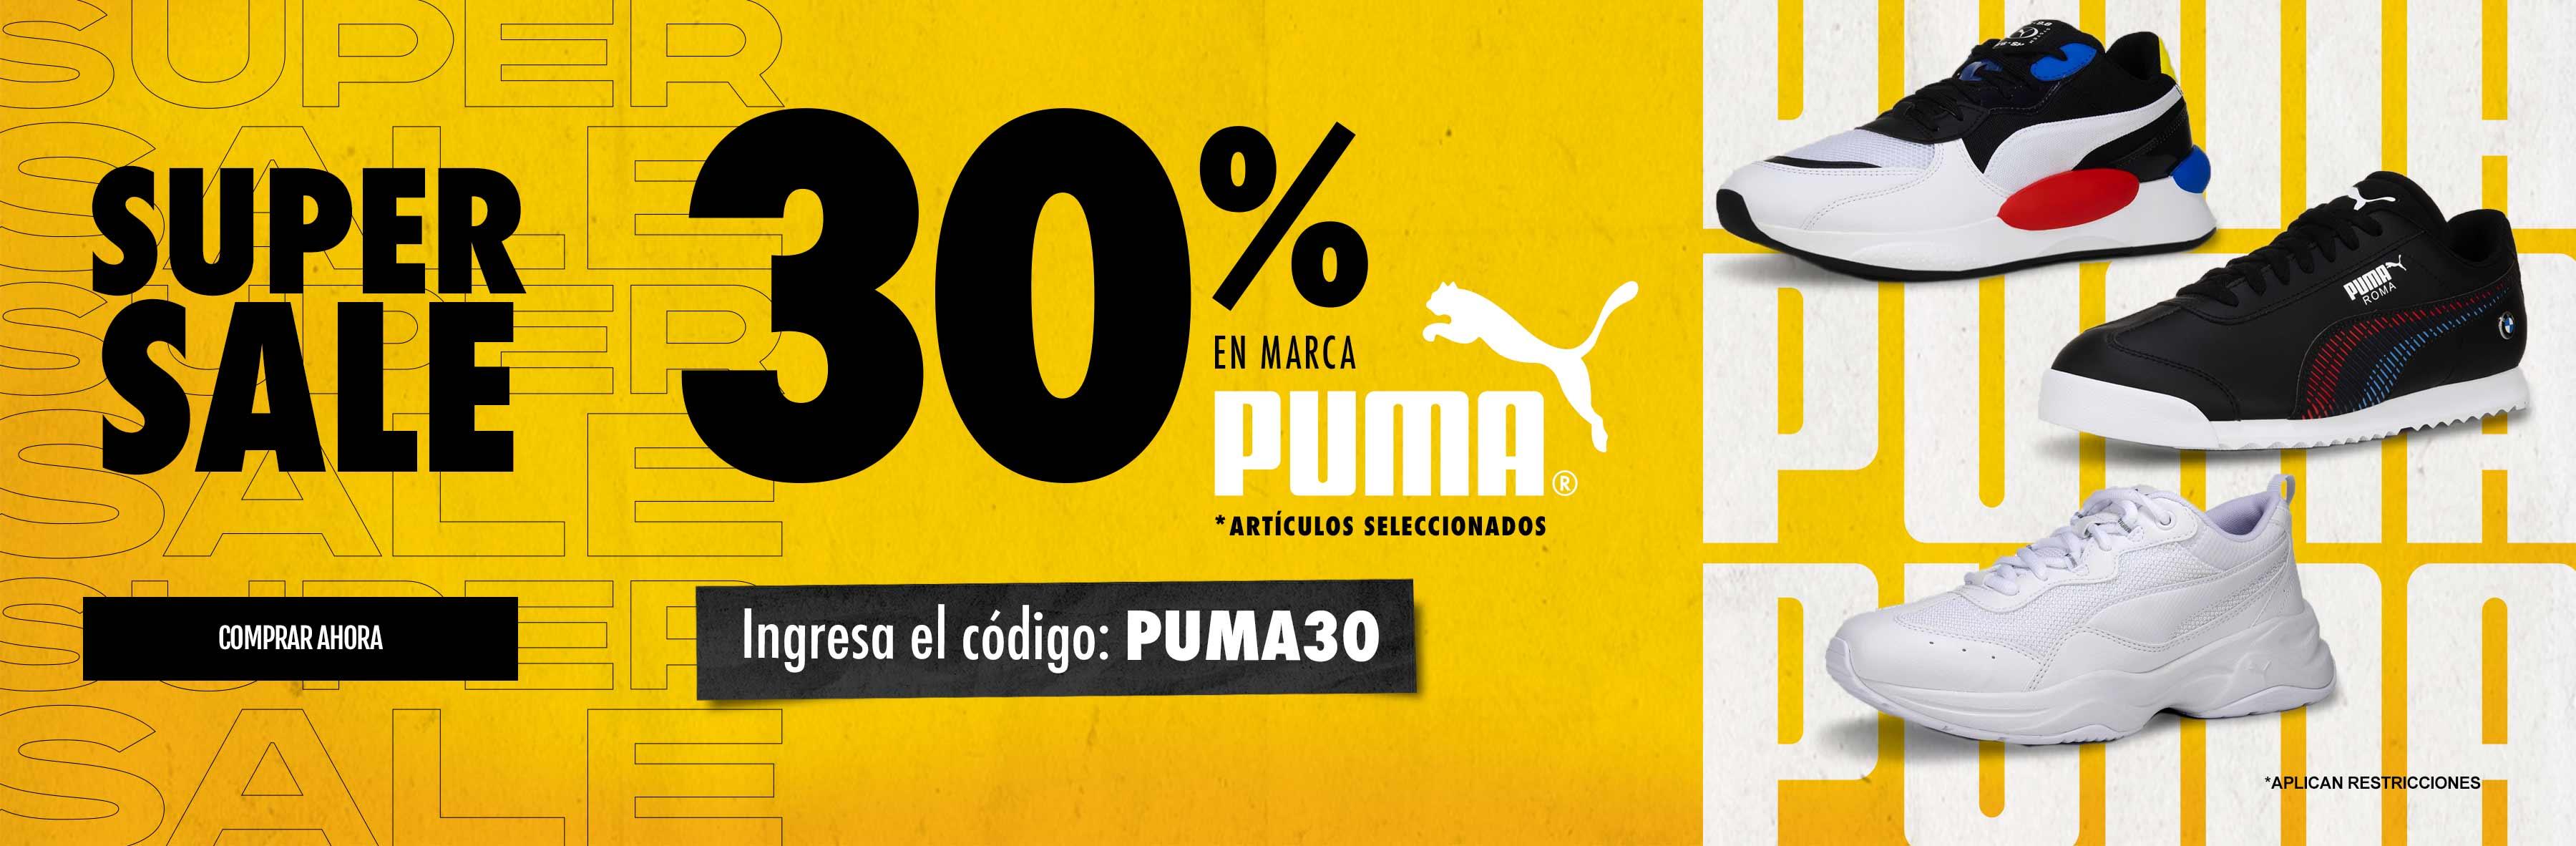 Puma 30%